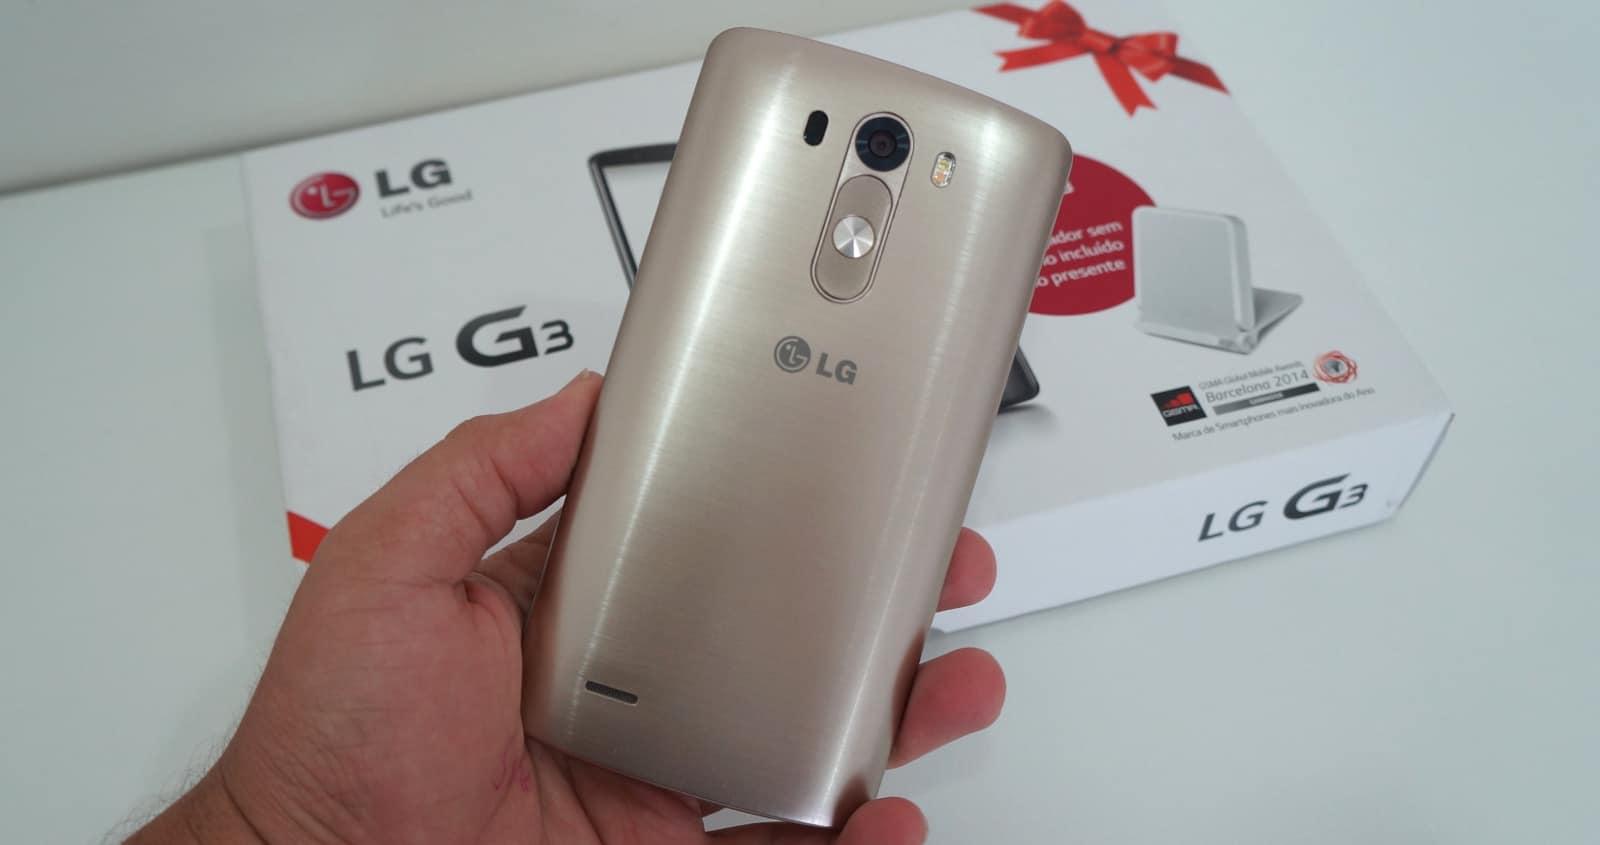 69f82930aa9 Vale a pena comprar o LG G3? – Tudo em Tecnologia